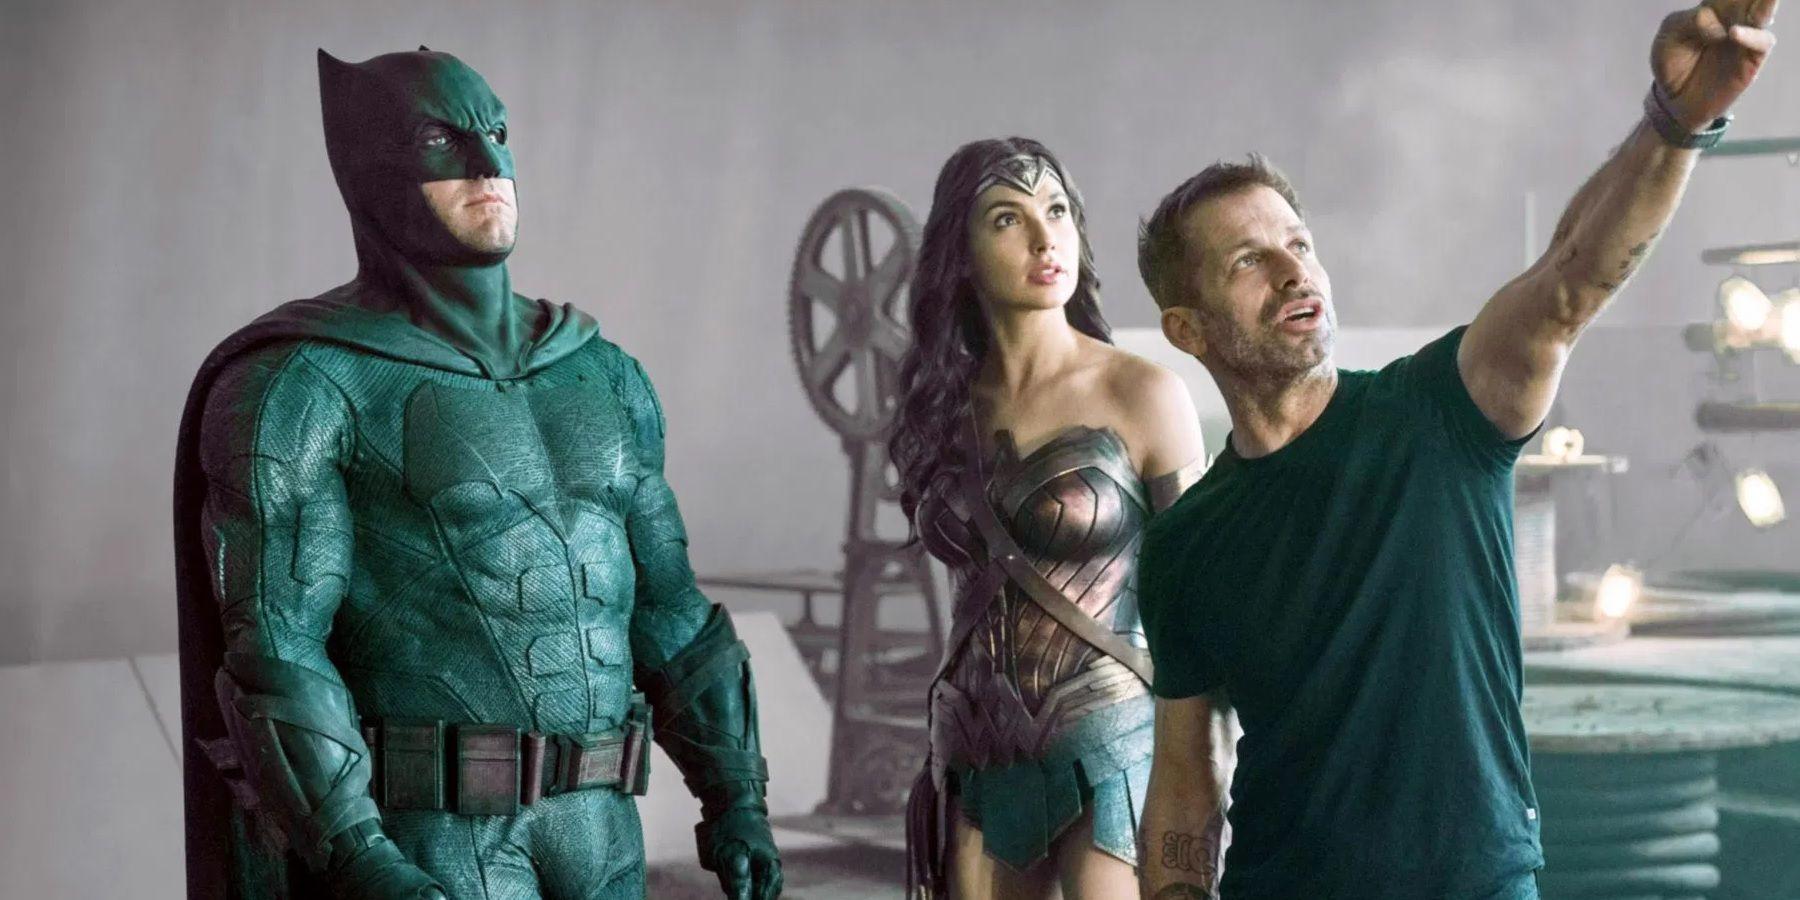 Zack Snyder's Justice League Is No Longer a 4-Part Release